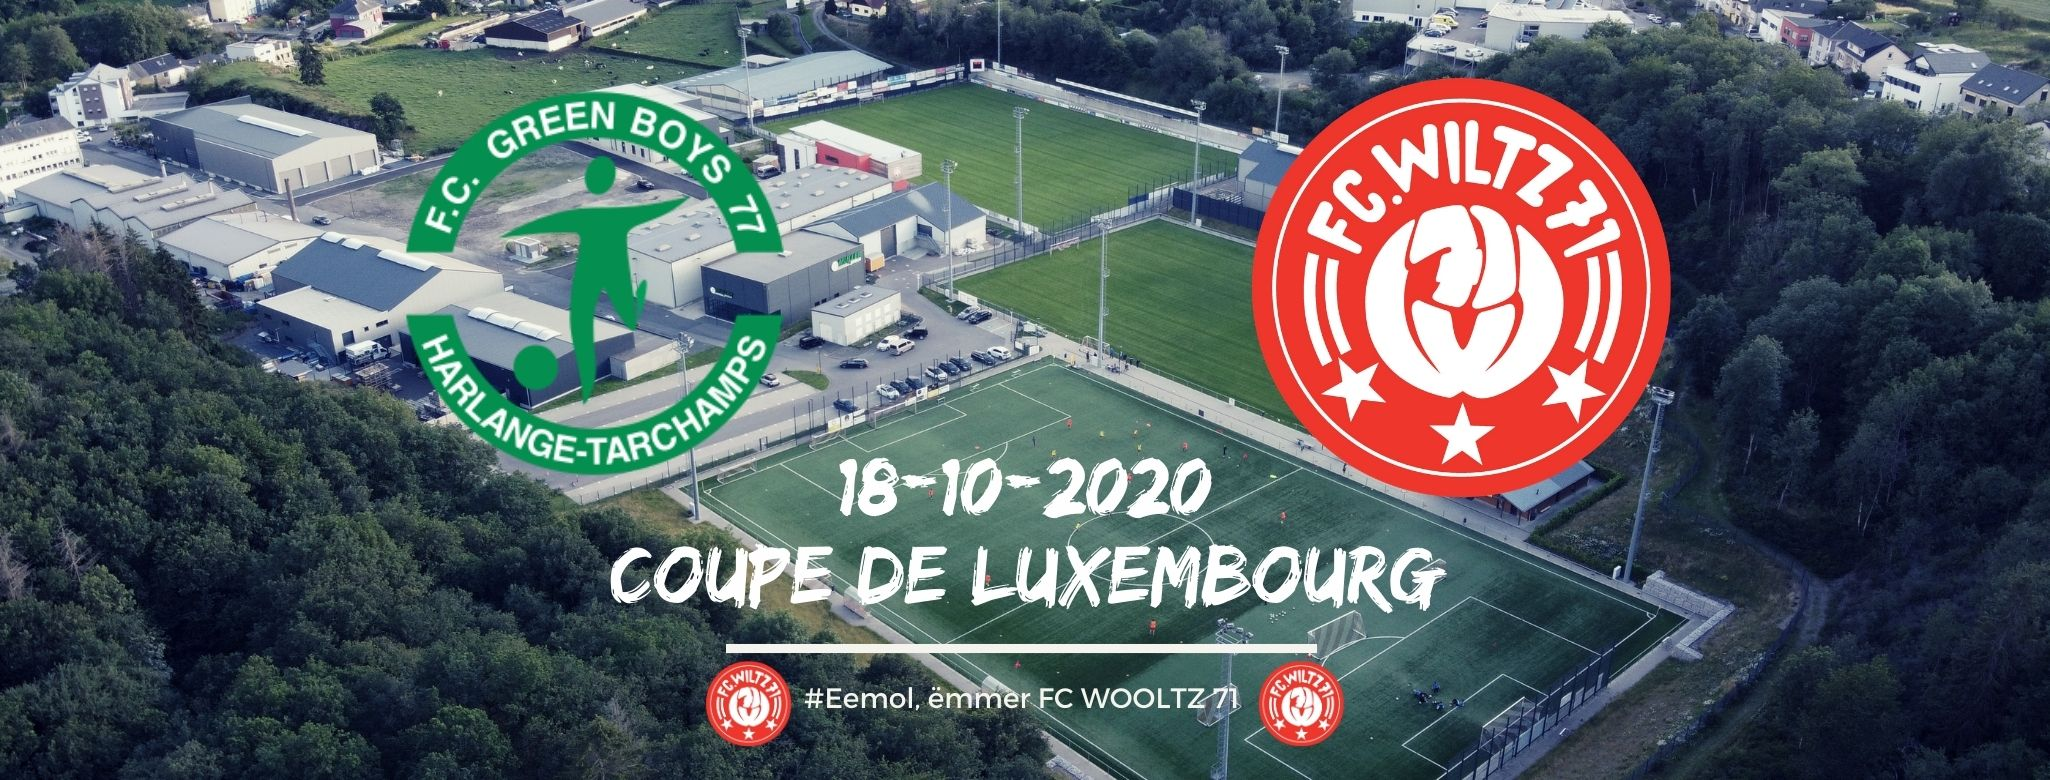 COUPE DE LUXEMBOURG: FC GREEN BOYS 77 HARLANGE VS FC WILTZ 71